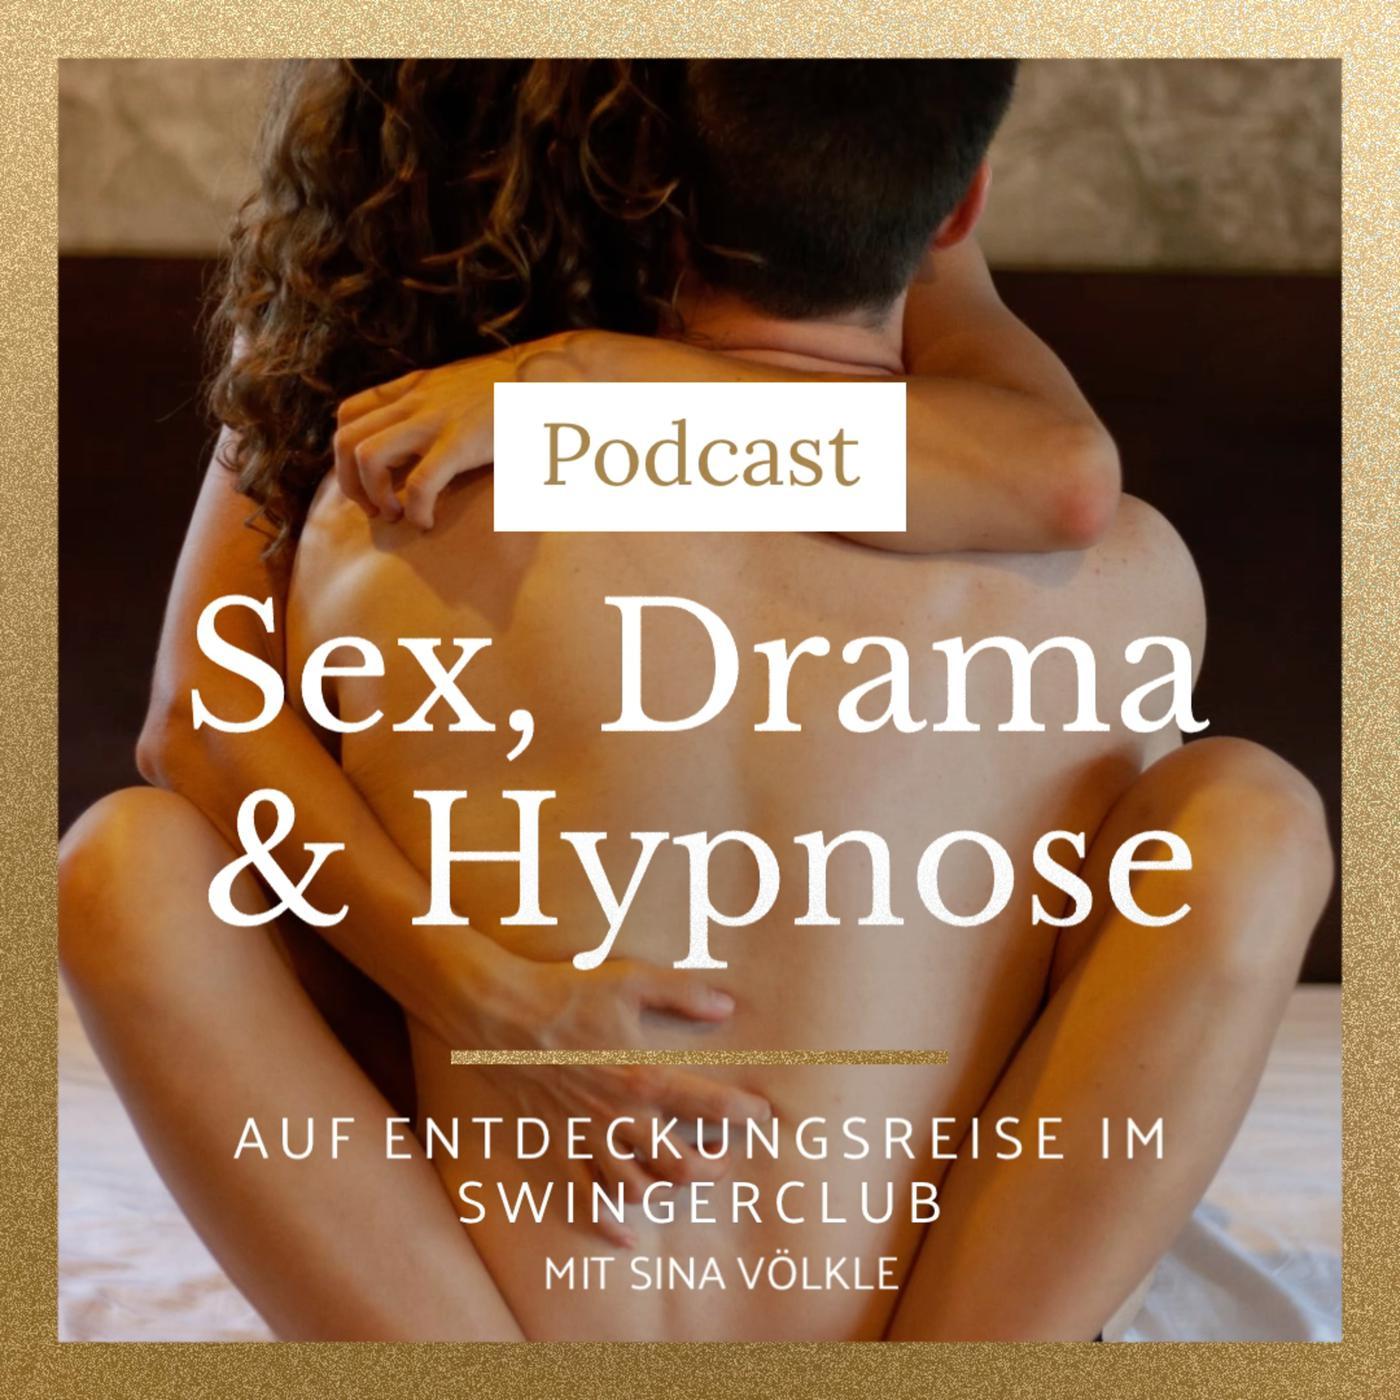 Sex hypnose Hypnosis Sex